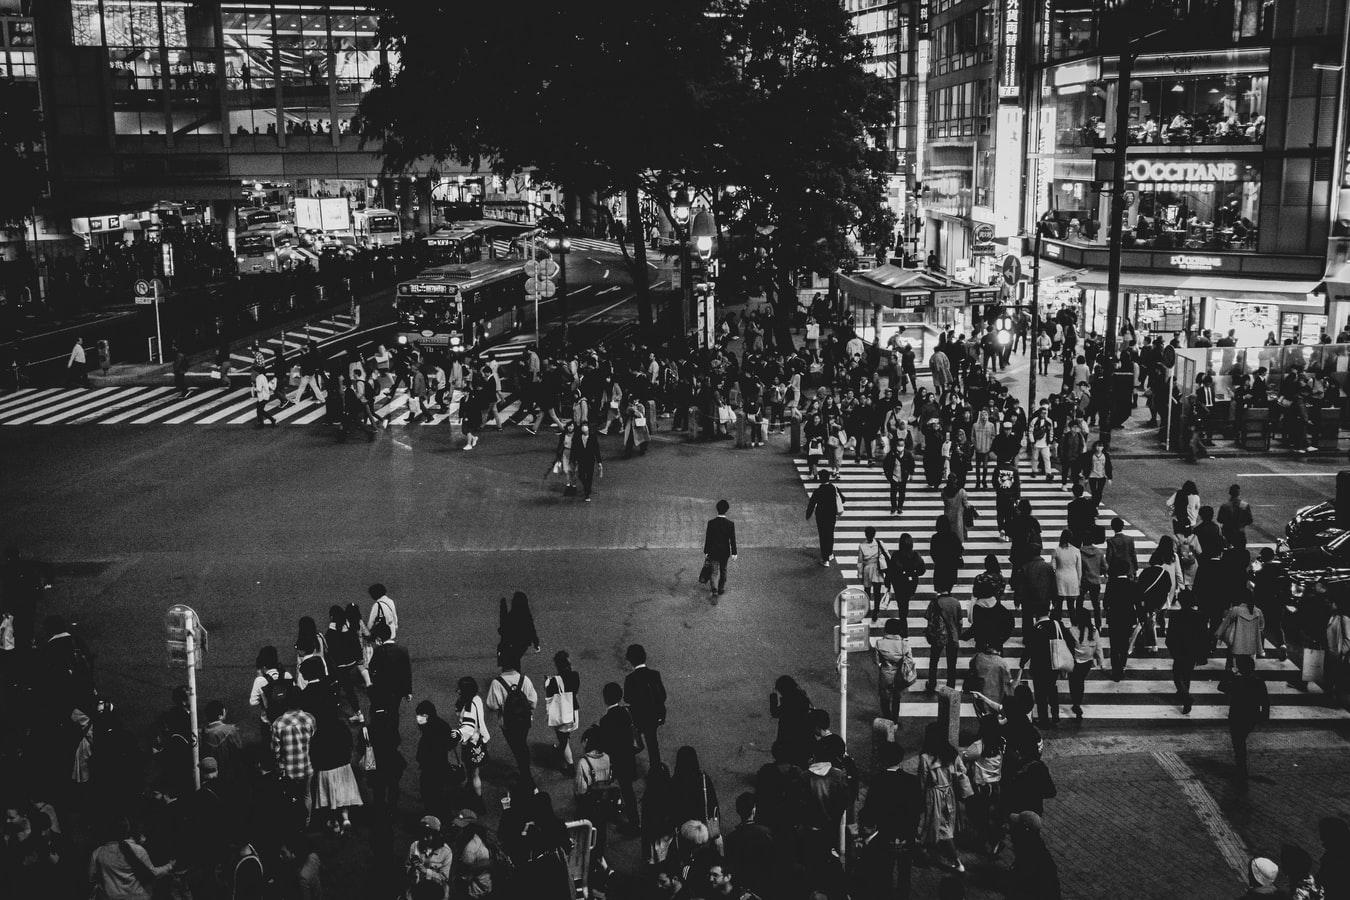 [SCD] La rue, simple moyen de circulation ou réel espace de dialogue ?